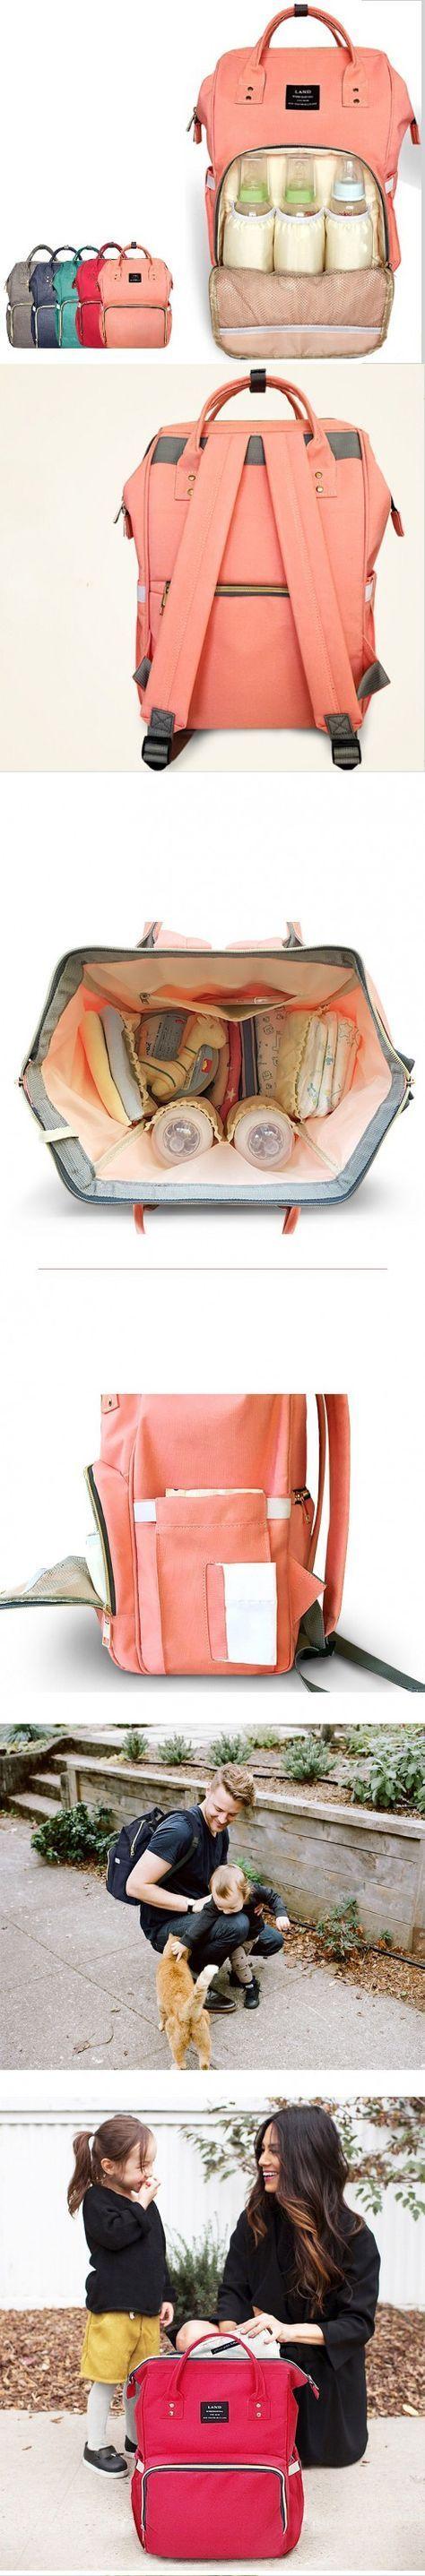 Fashion Mummy Maternity Nappy Bag Brand Large Capacity Baby Bag Travel Backpack Desiger Nursing Bag for Baby Care $44.96